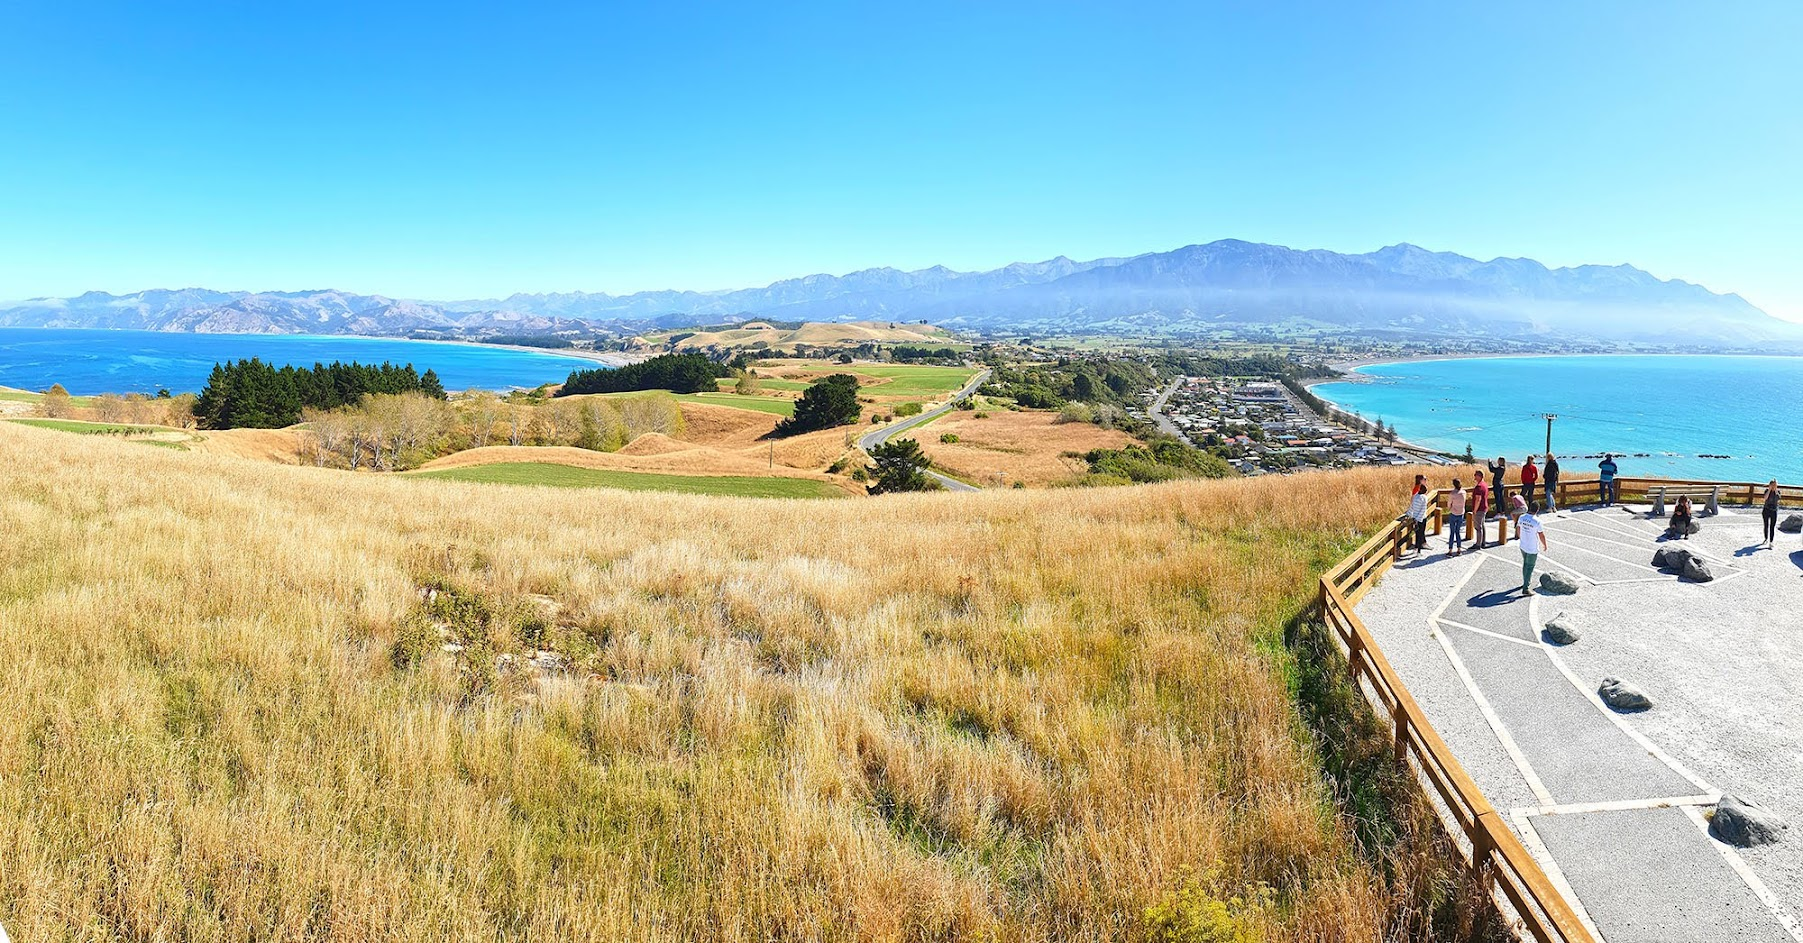 Como tirar o VISTO DA NOVA ZELÂNDIA - Tudo o que precisa de saber